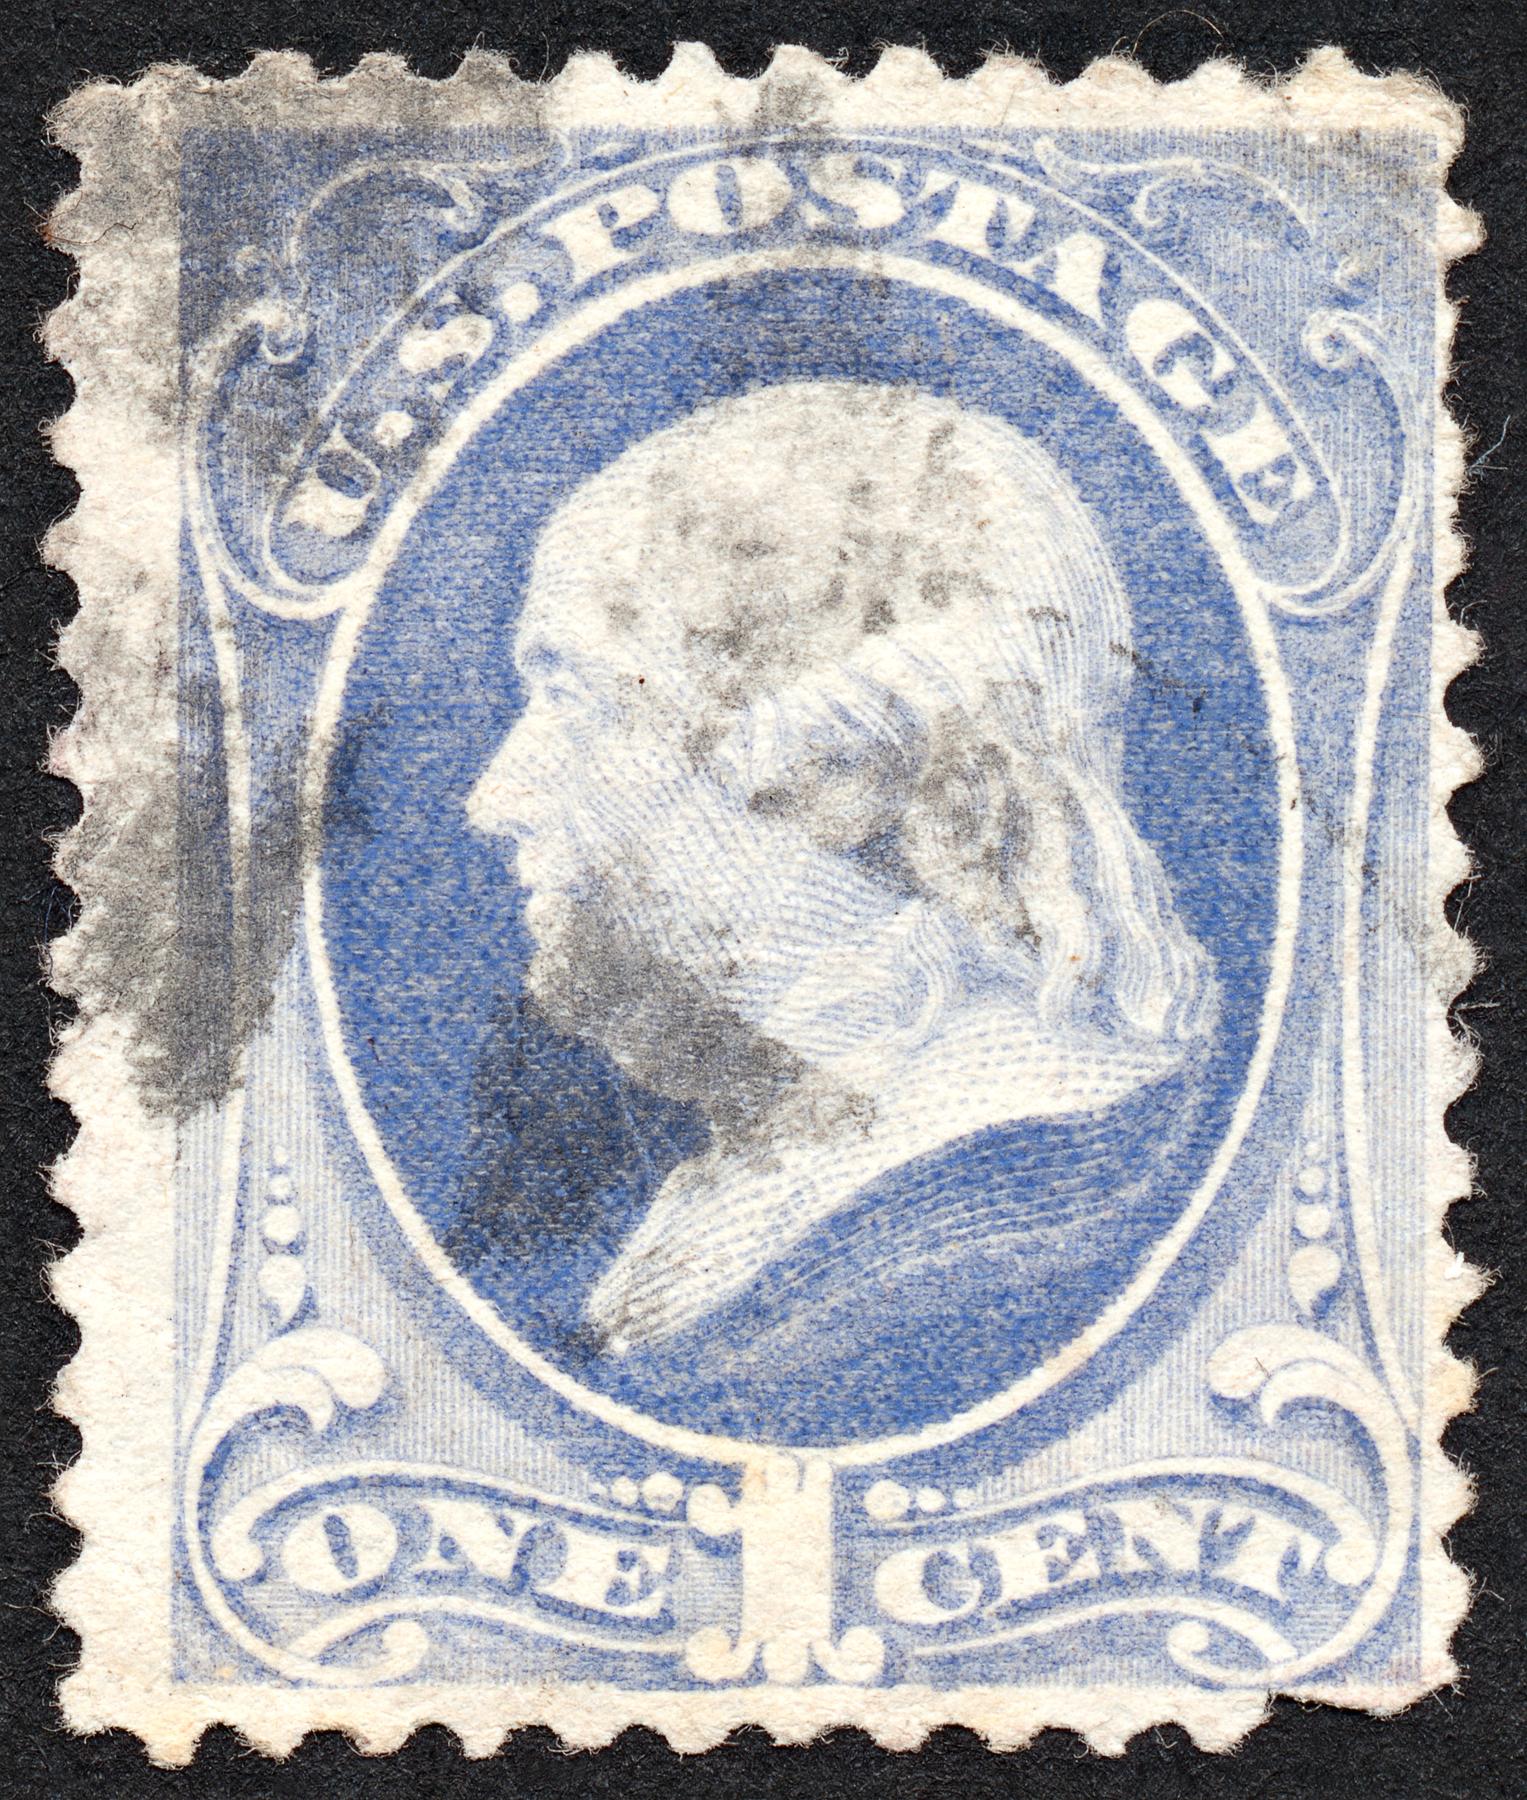 Blue Benjamin Franklin Stamp, 1, Postal, Resource, Rectangular, HQ Photo